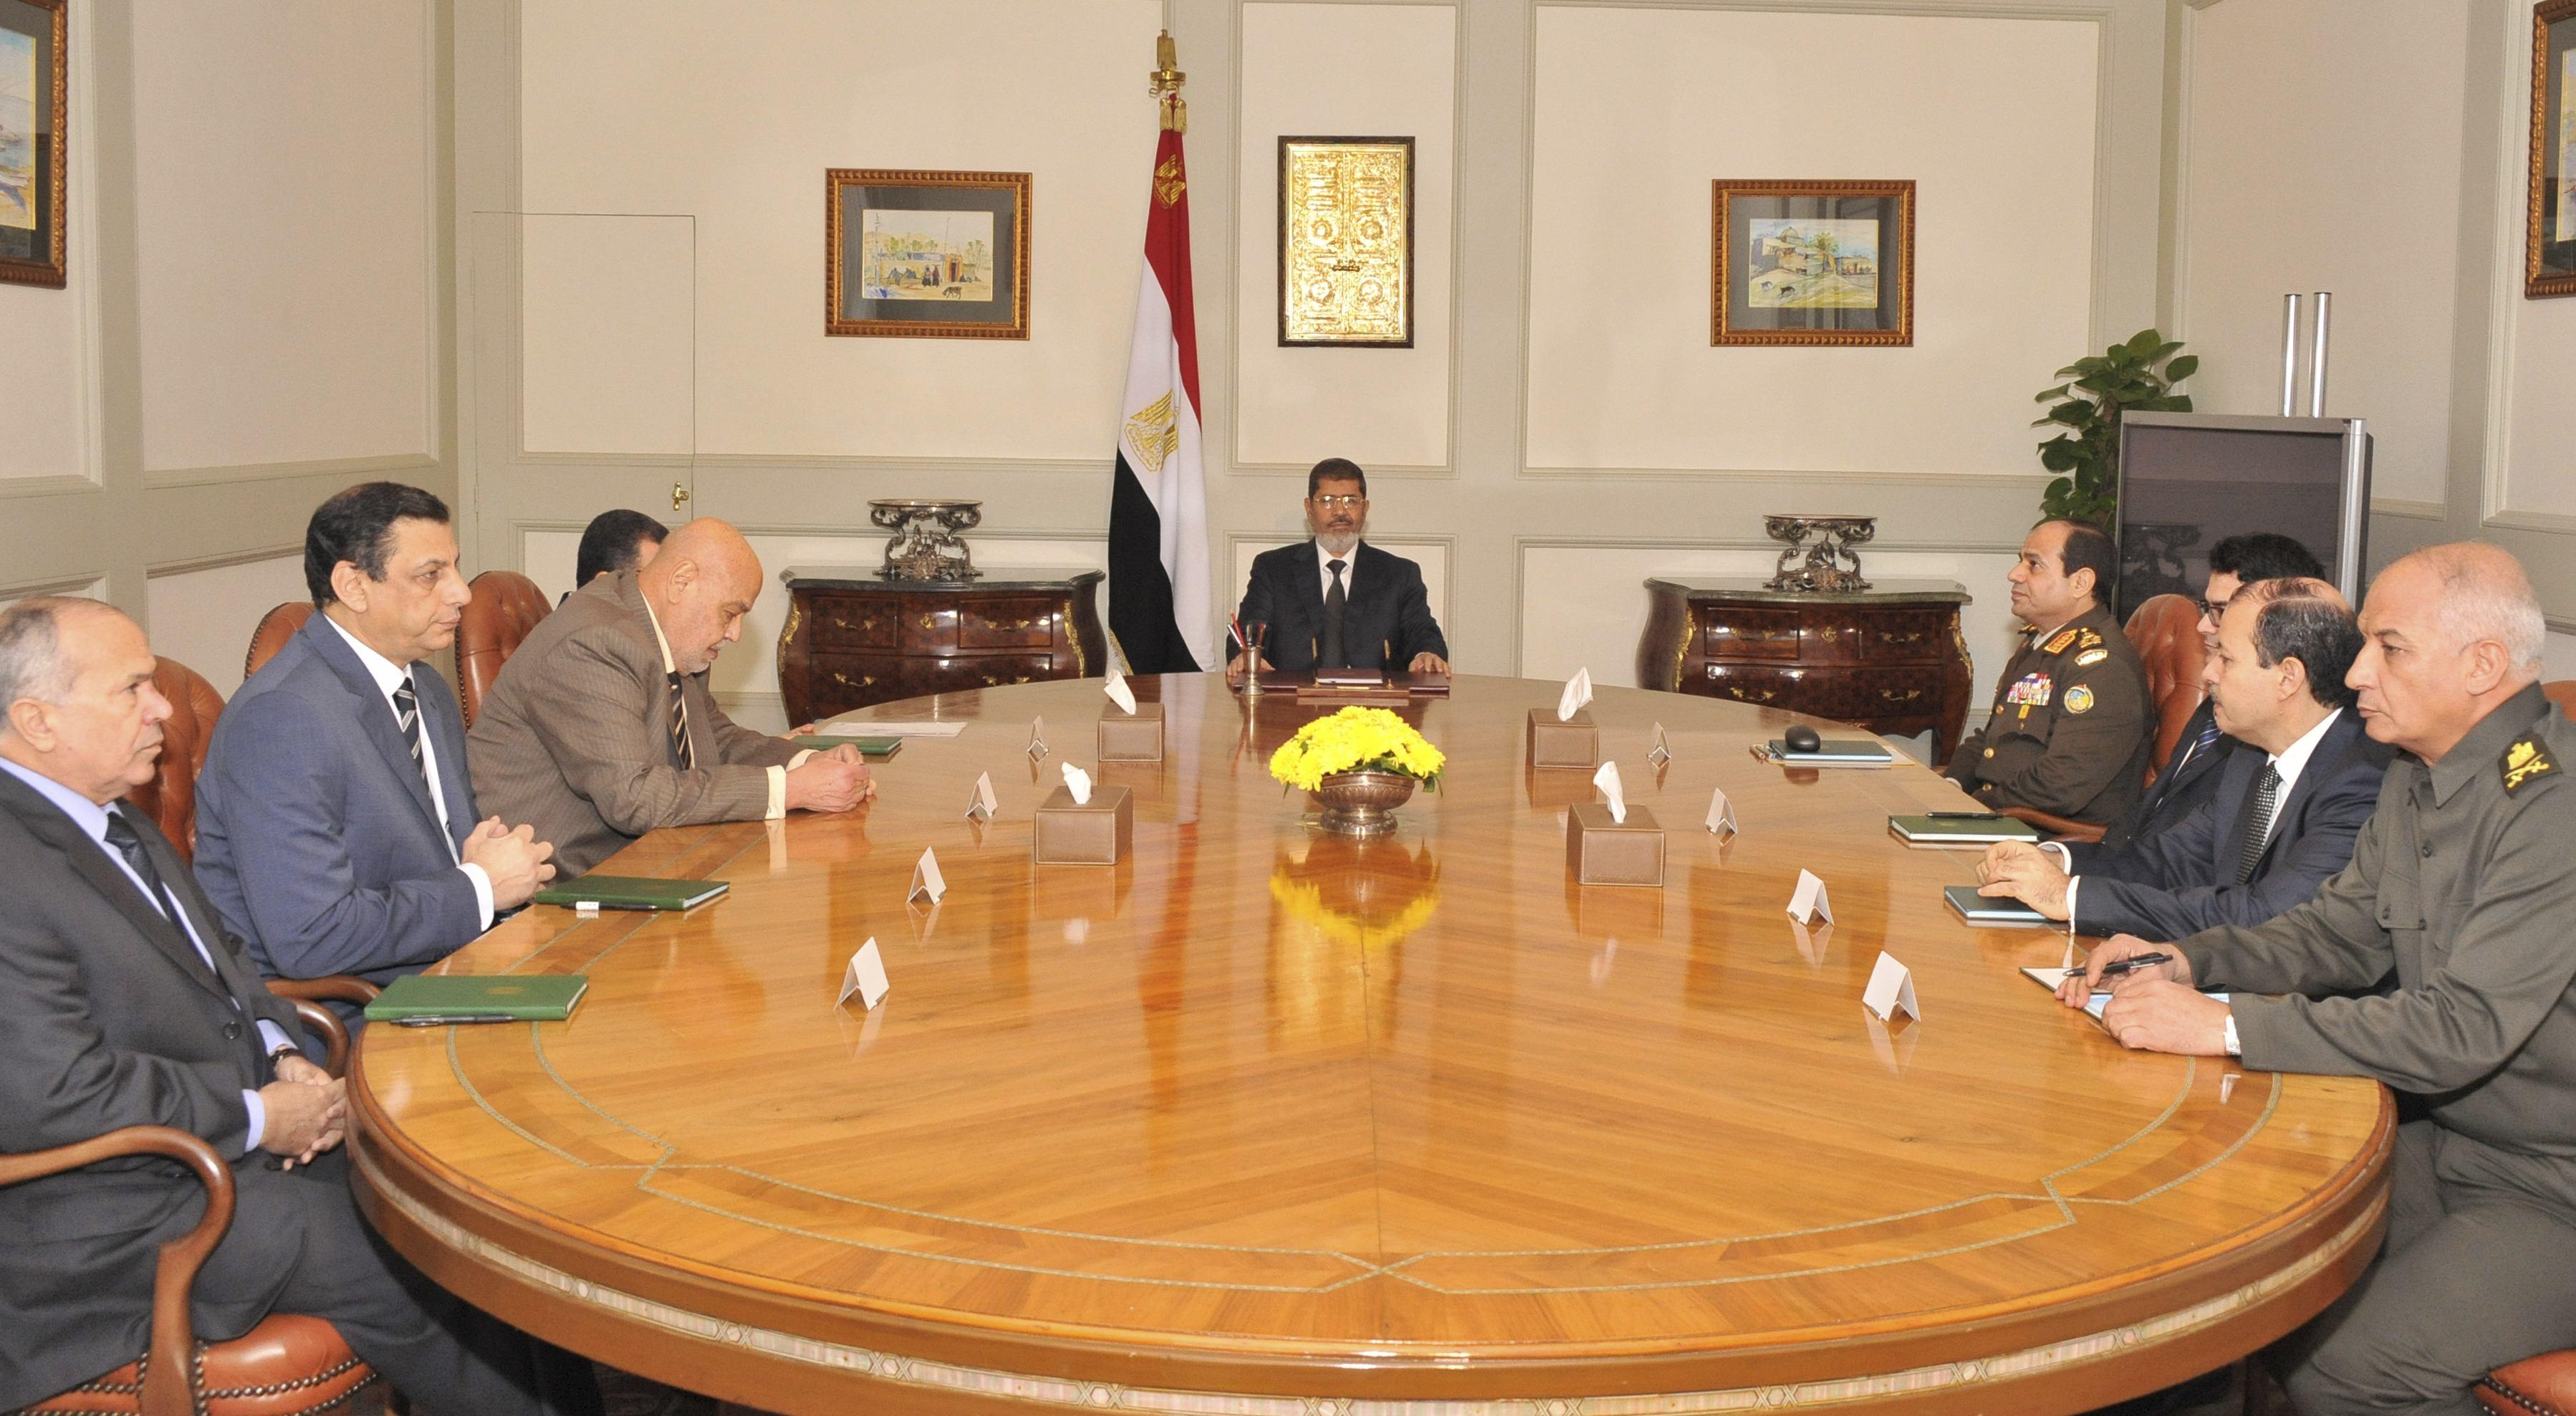 Egypt army statement balanced, says Muslim Brotherhood official